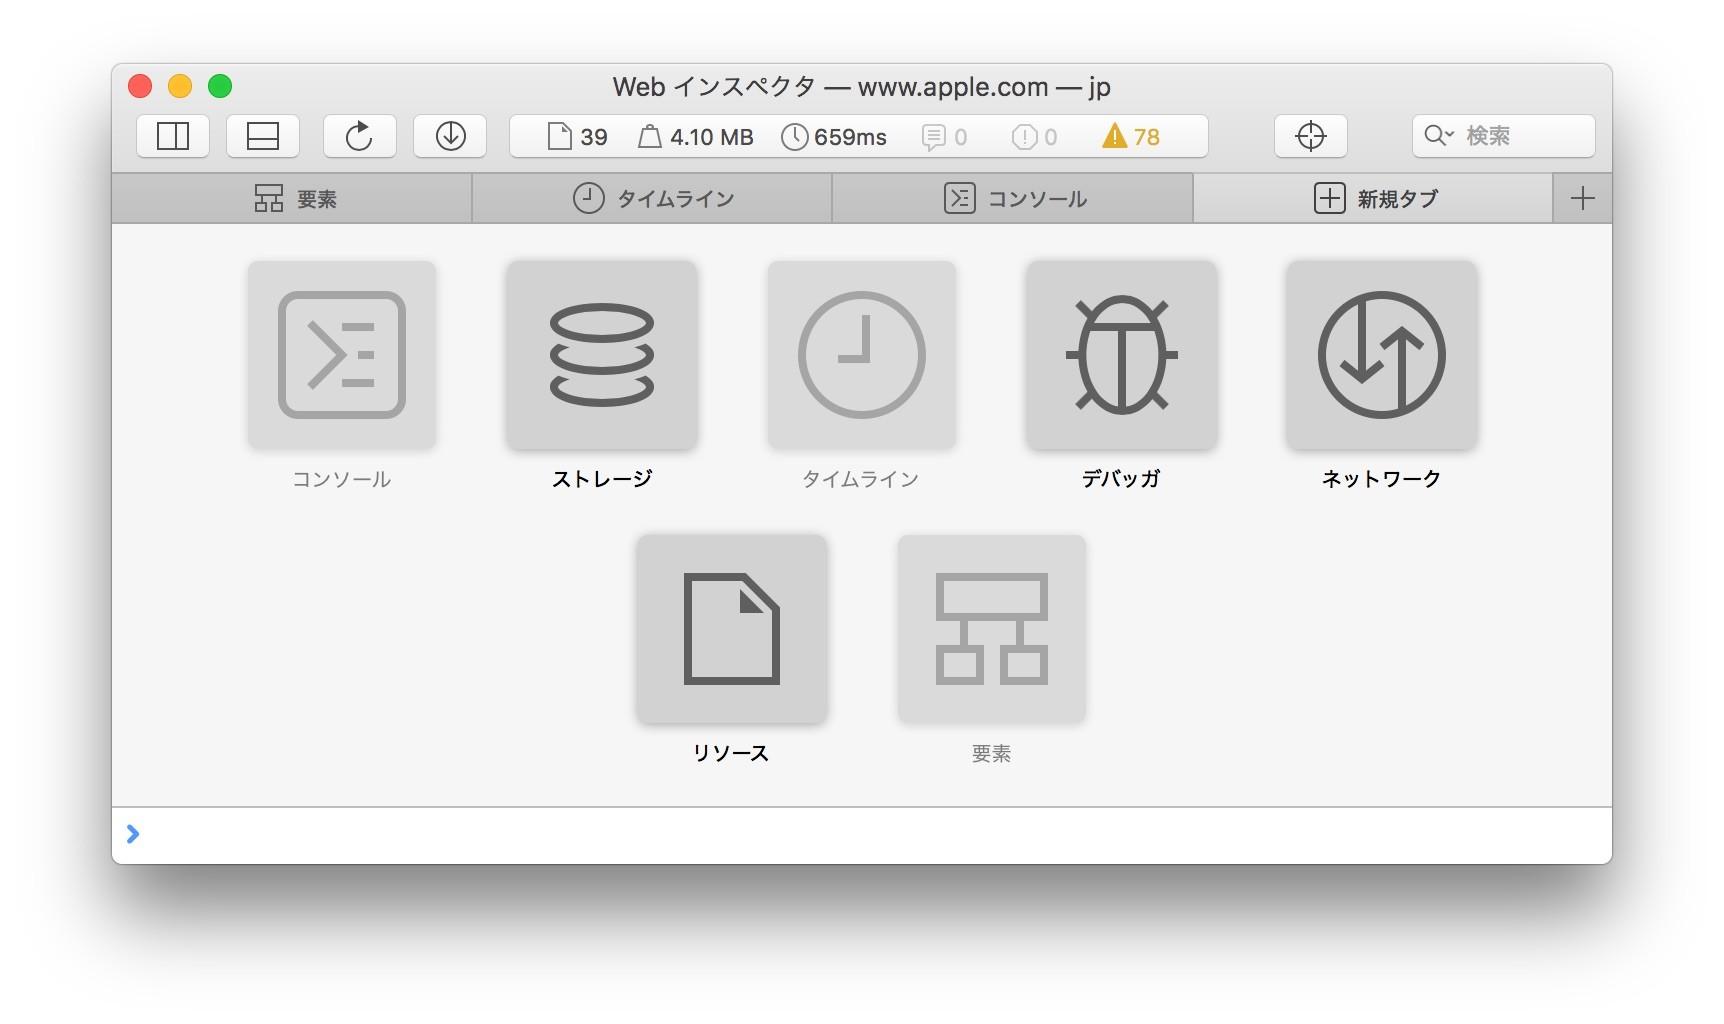 Safari9-Web-インスペクタ-Tab